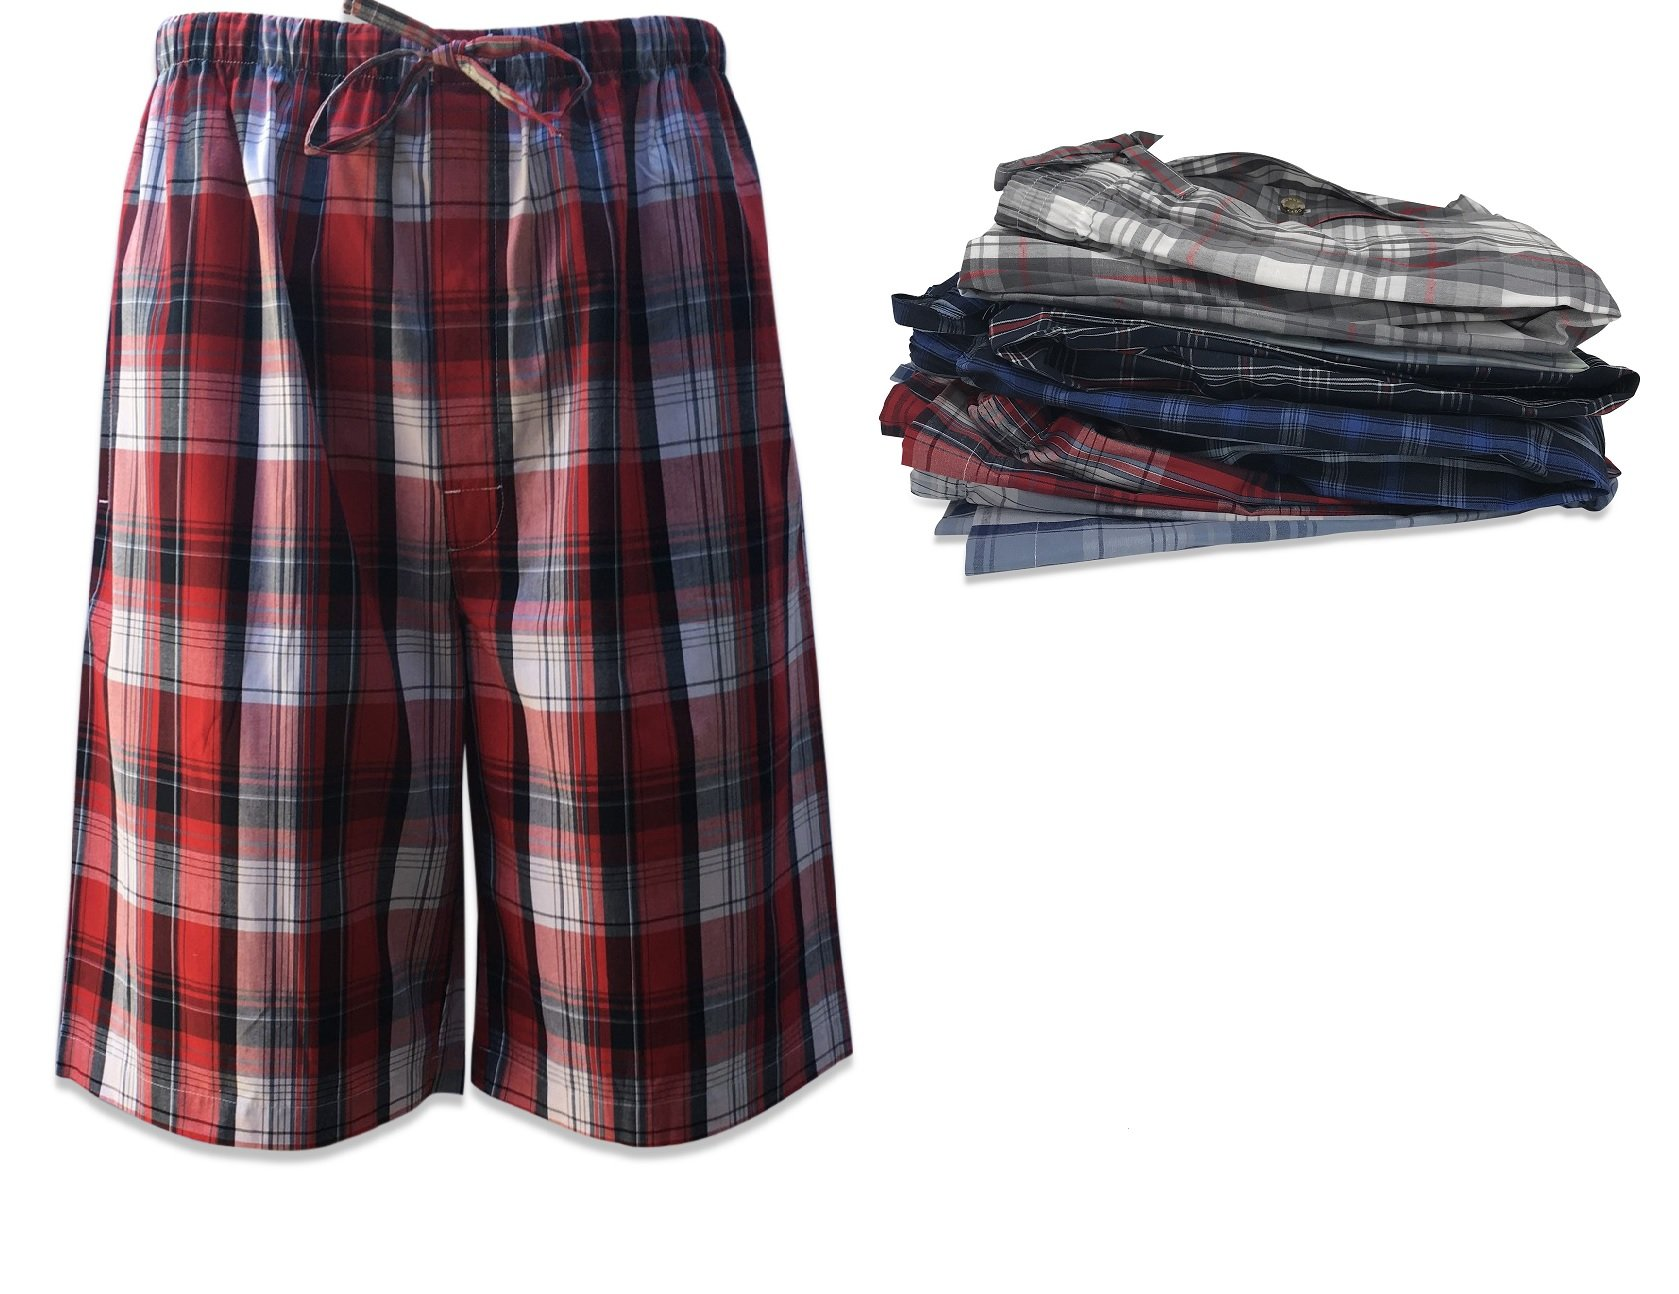 Men's 3 Pack Super Soft Woven Pajama & Sleep Jam Cargo Short Lounge Pants (X-Large, 3 Pack - Assorted Brilliant Plaids)